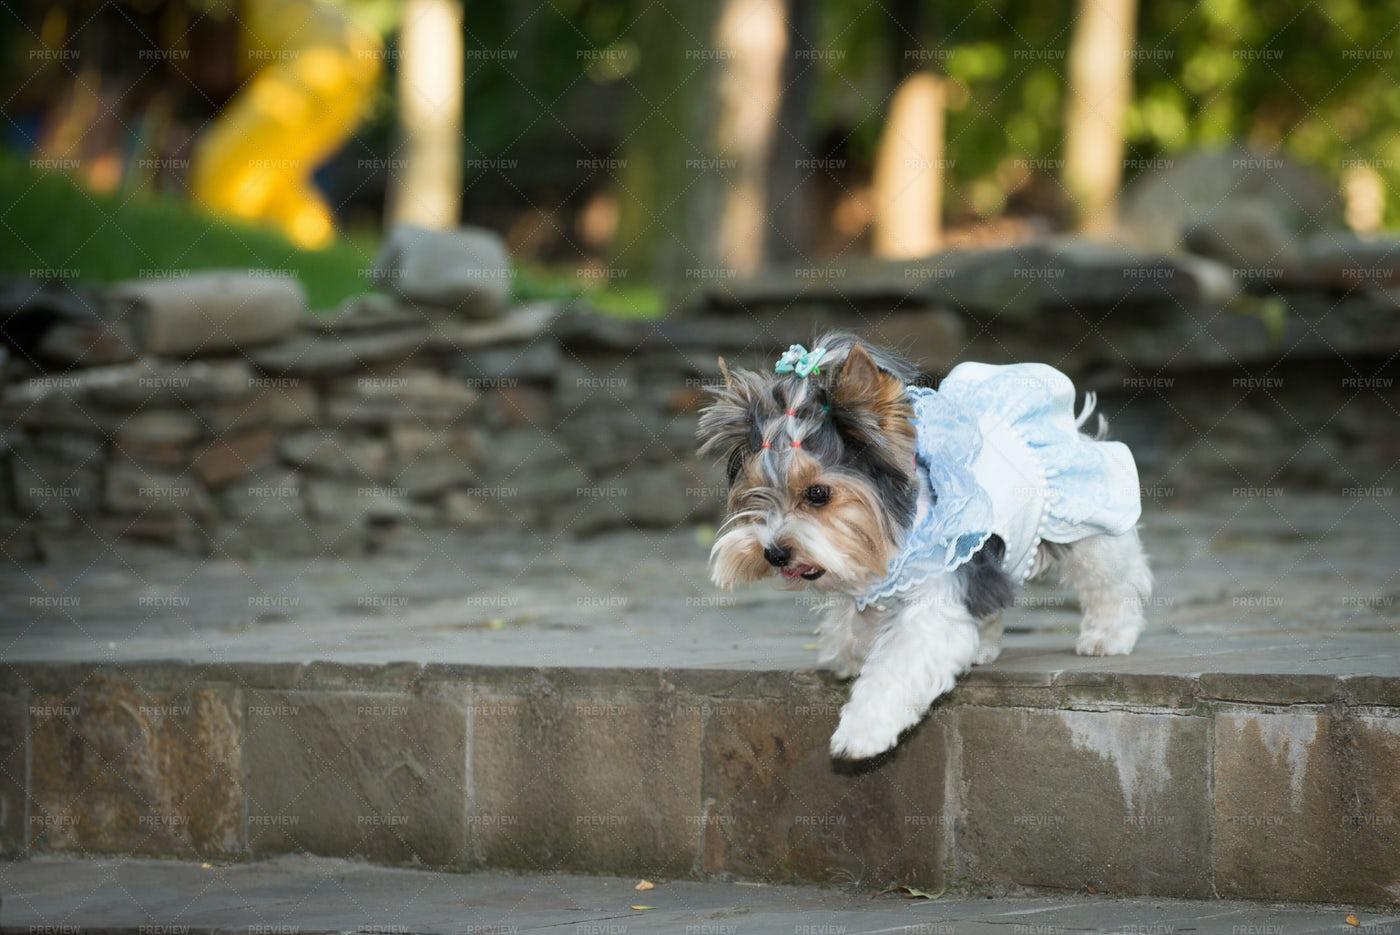 Dog In A Wedding Dress: Stock Photos